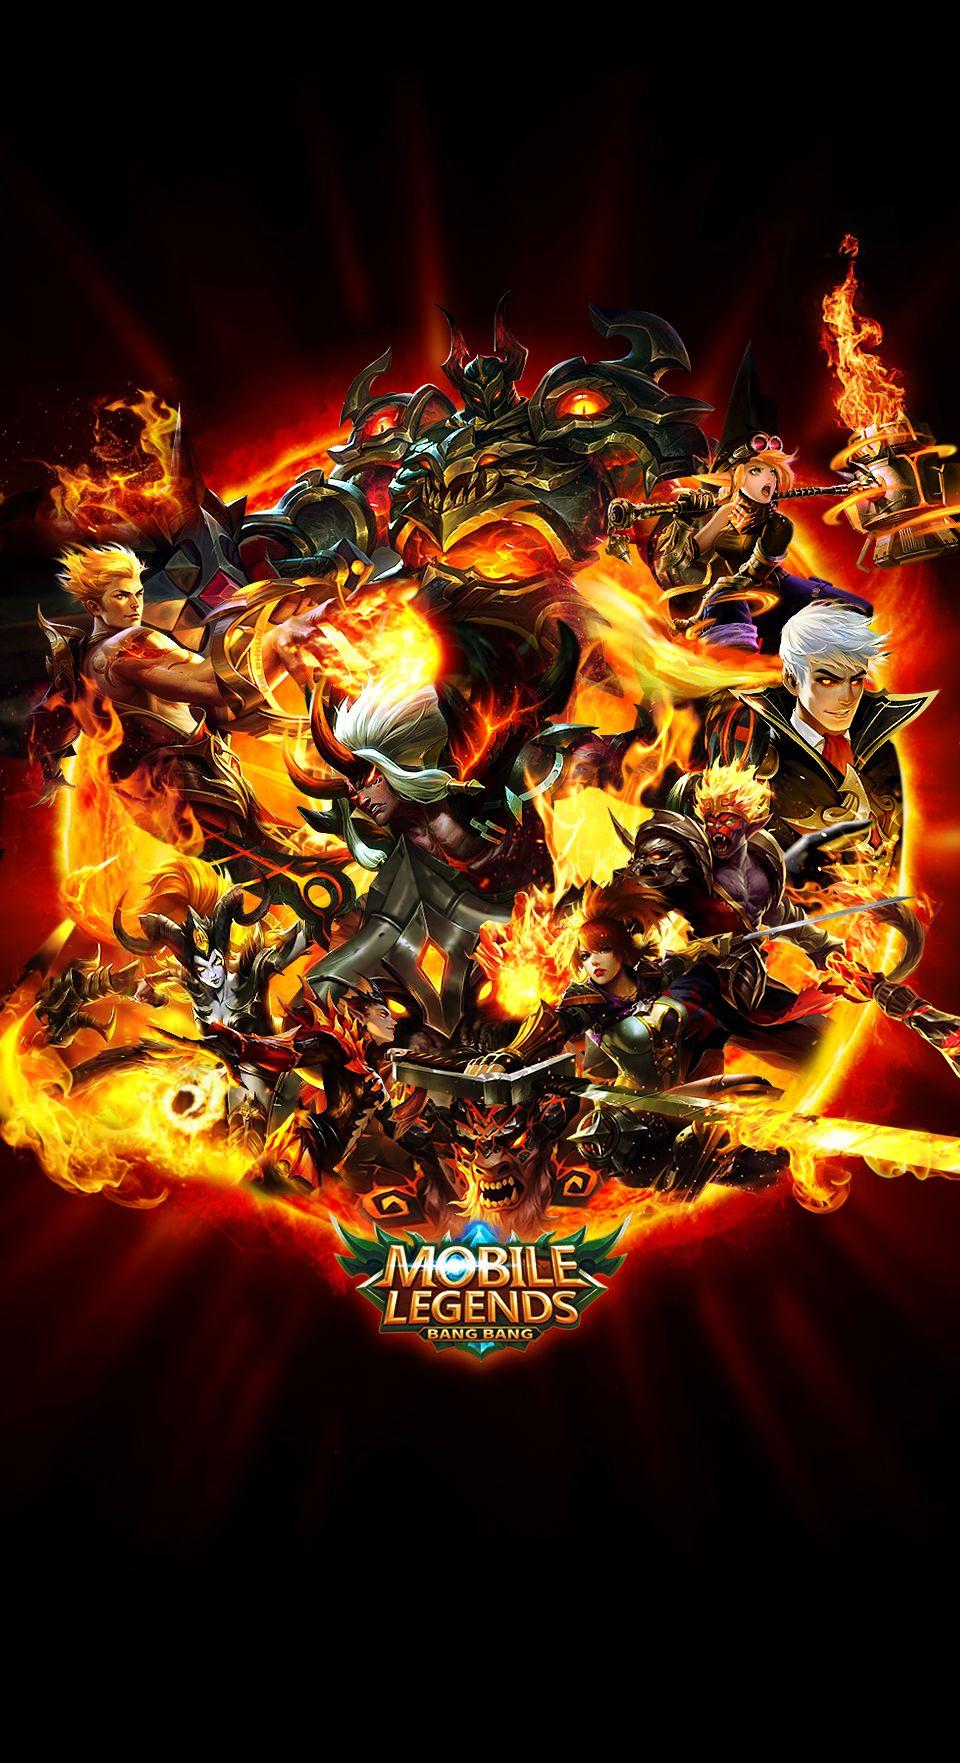 Team Fire Red Mobile Legends Mobile legend wallpaper Mobile 960x1763